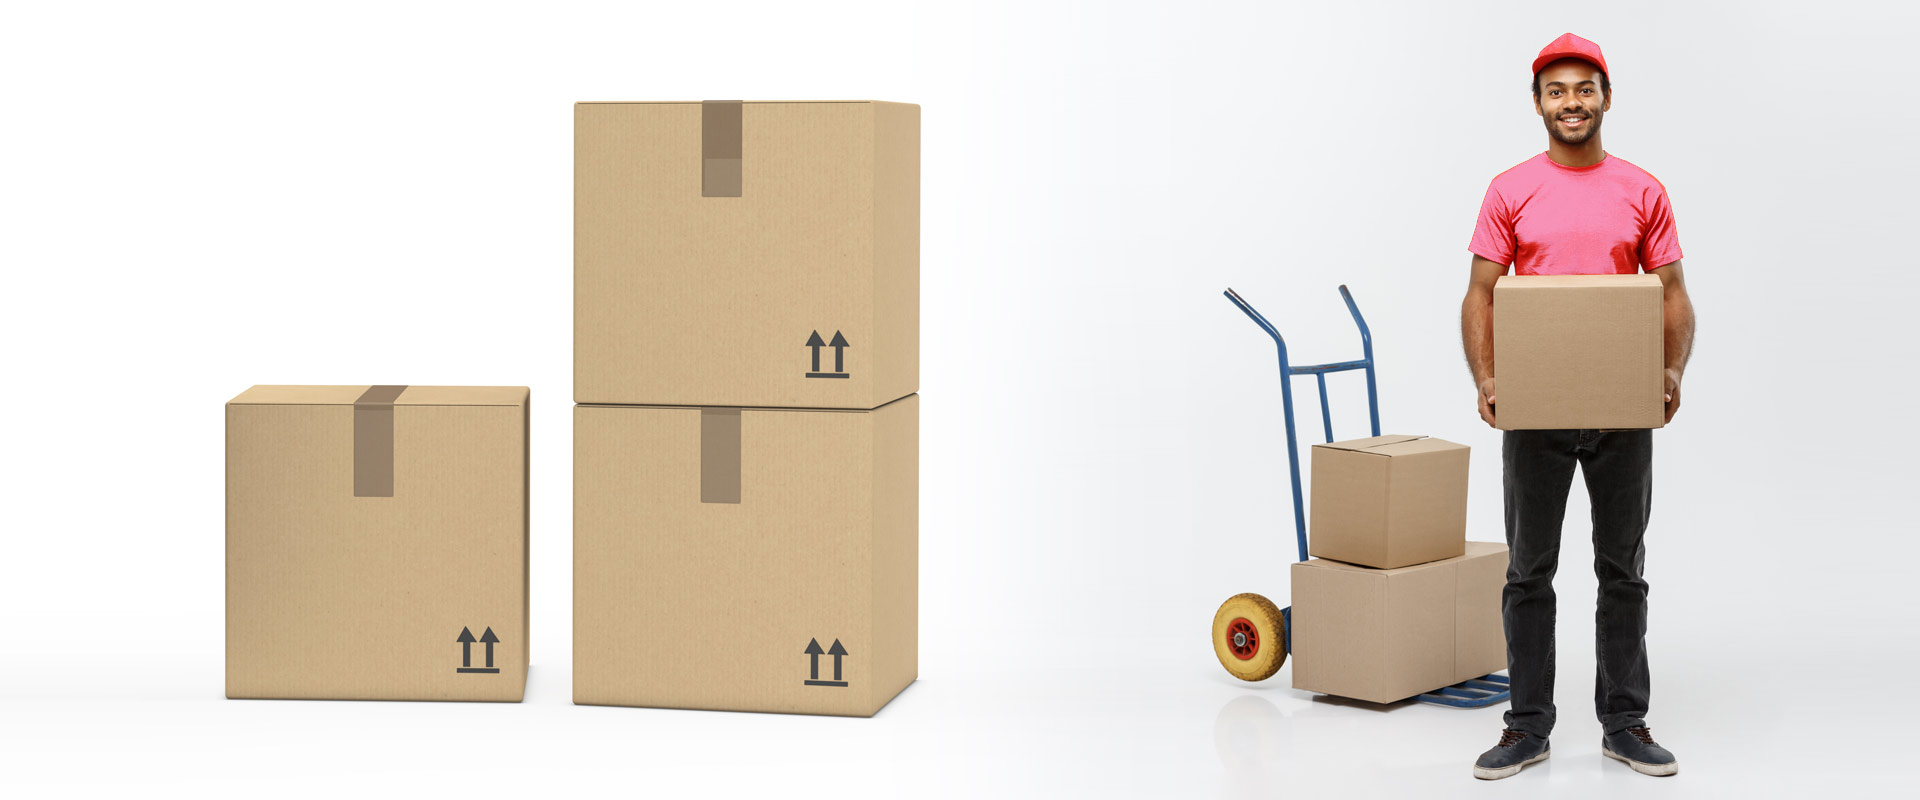 The Company Supplying